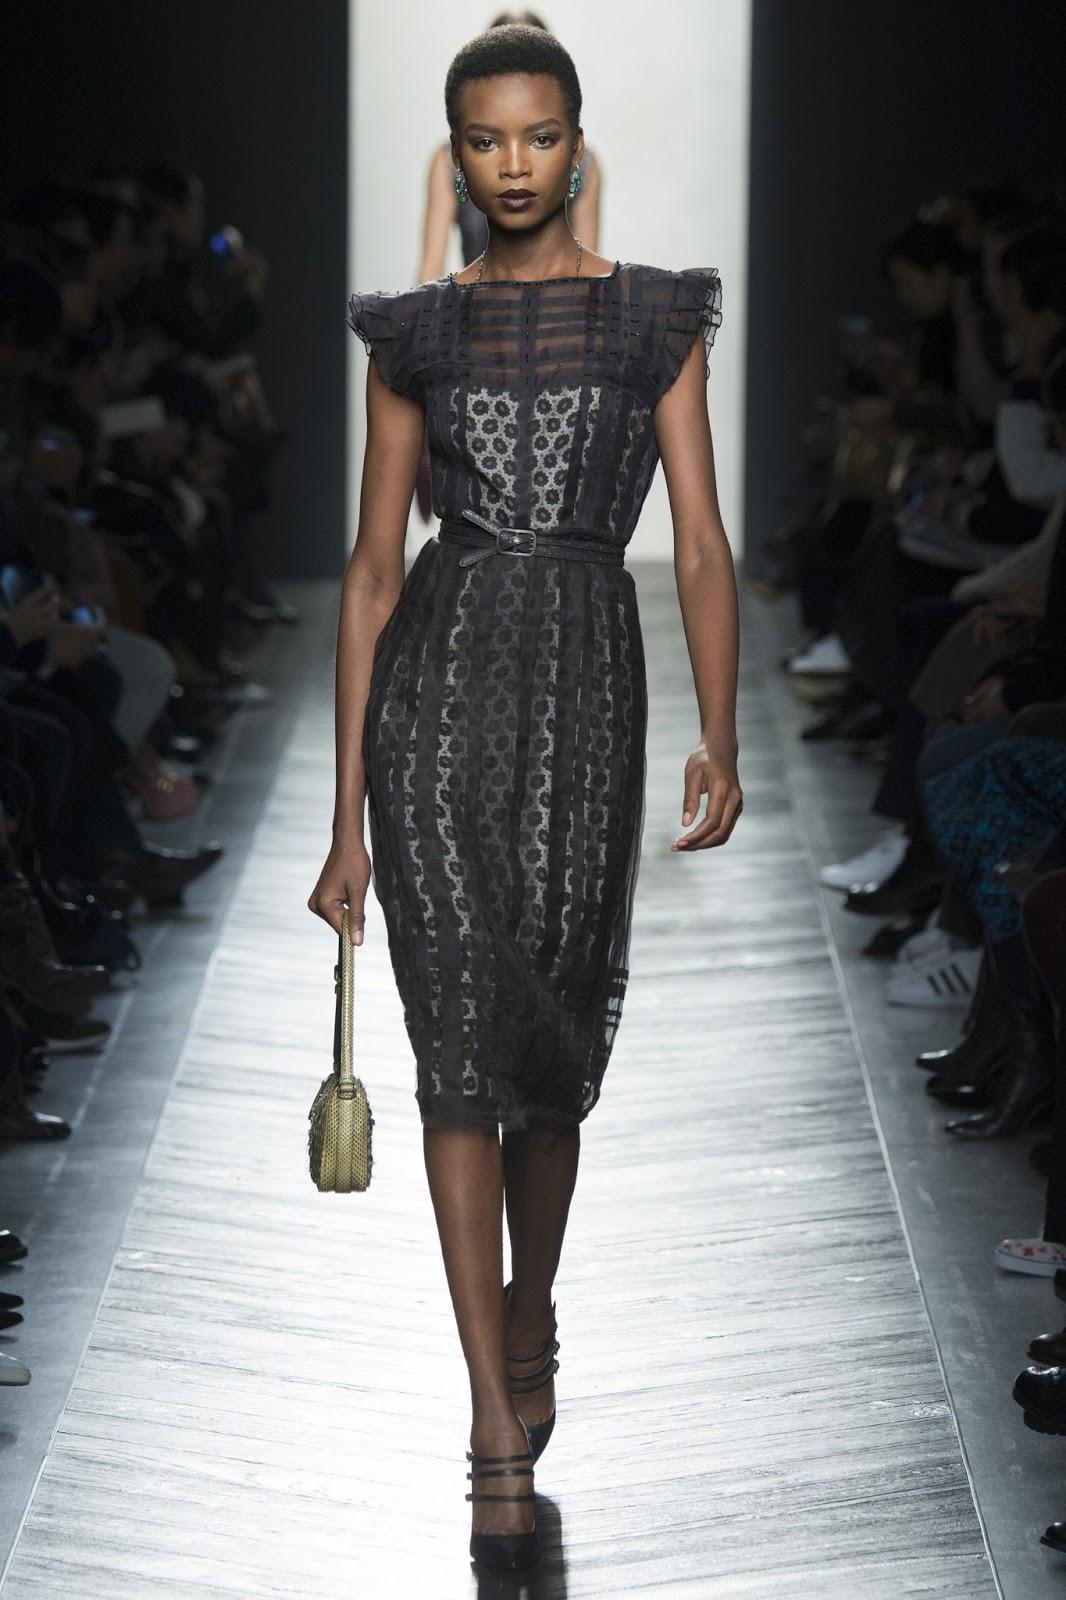 Milan fashion week FW16 best collections / Bottega Veneta Fall/Winter 2016 via www.fashionedbylove.co.uk